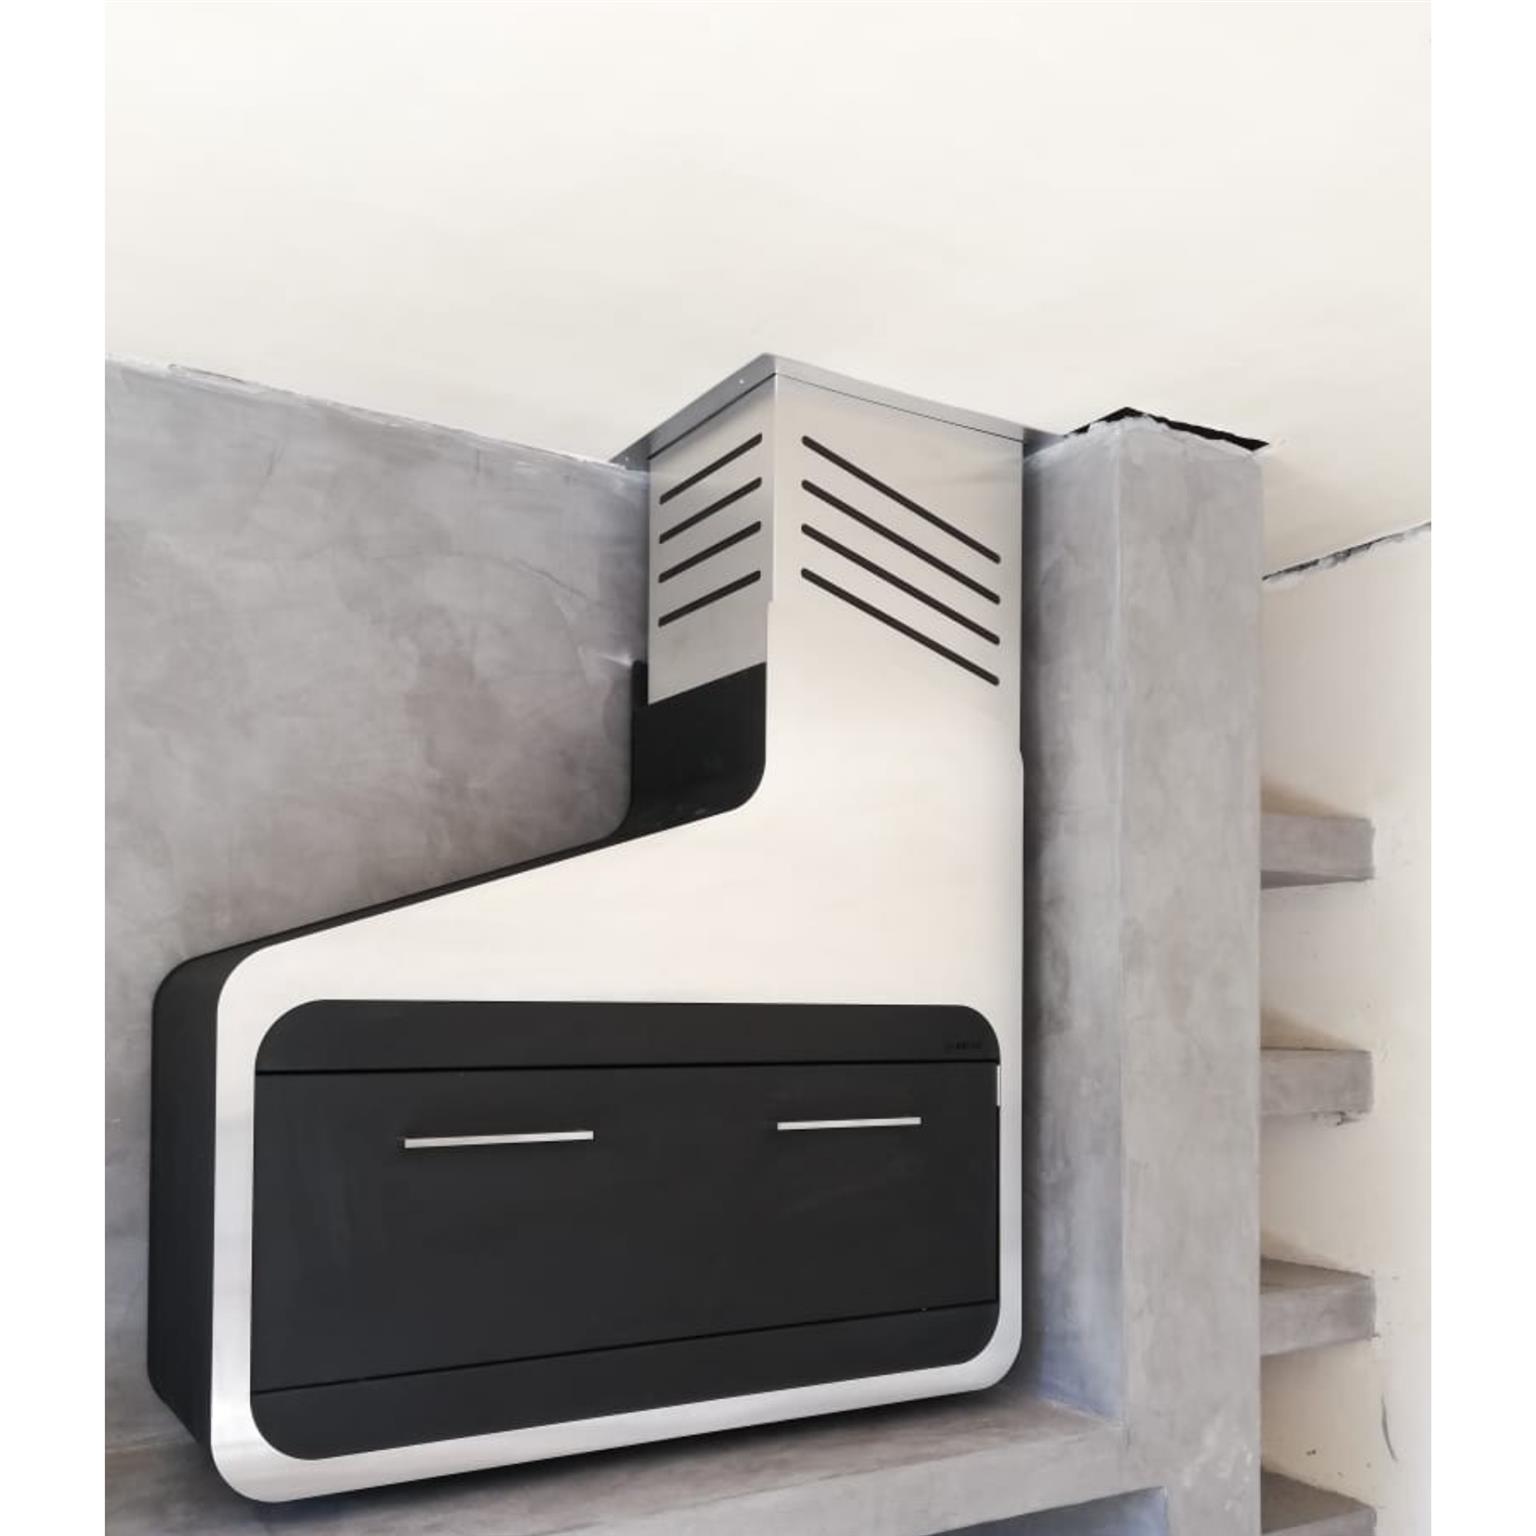 Stainless Steel Wall-Mount Braai